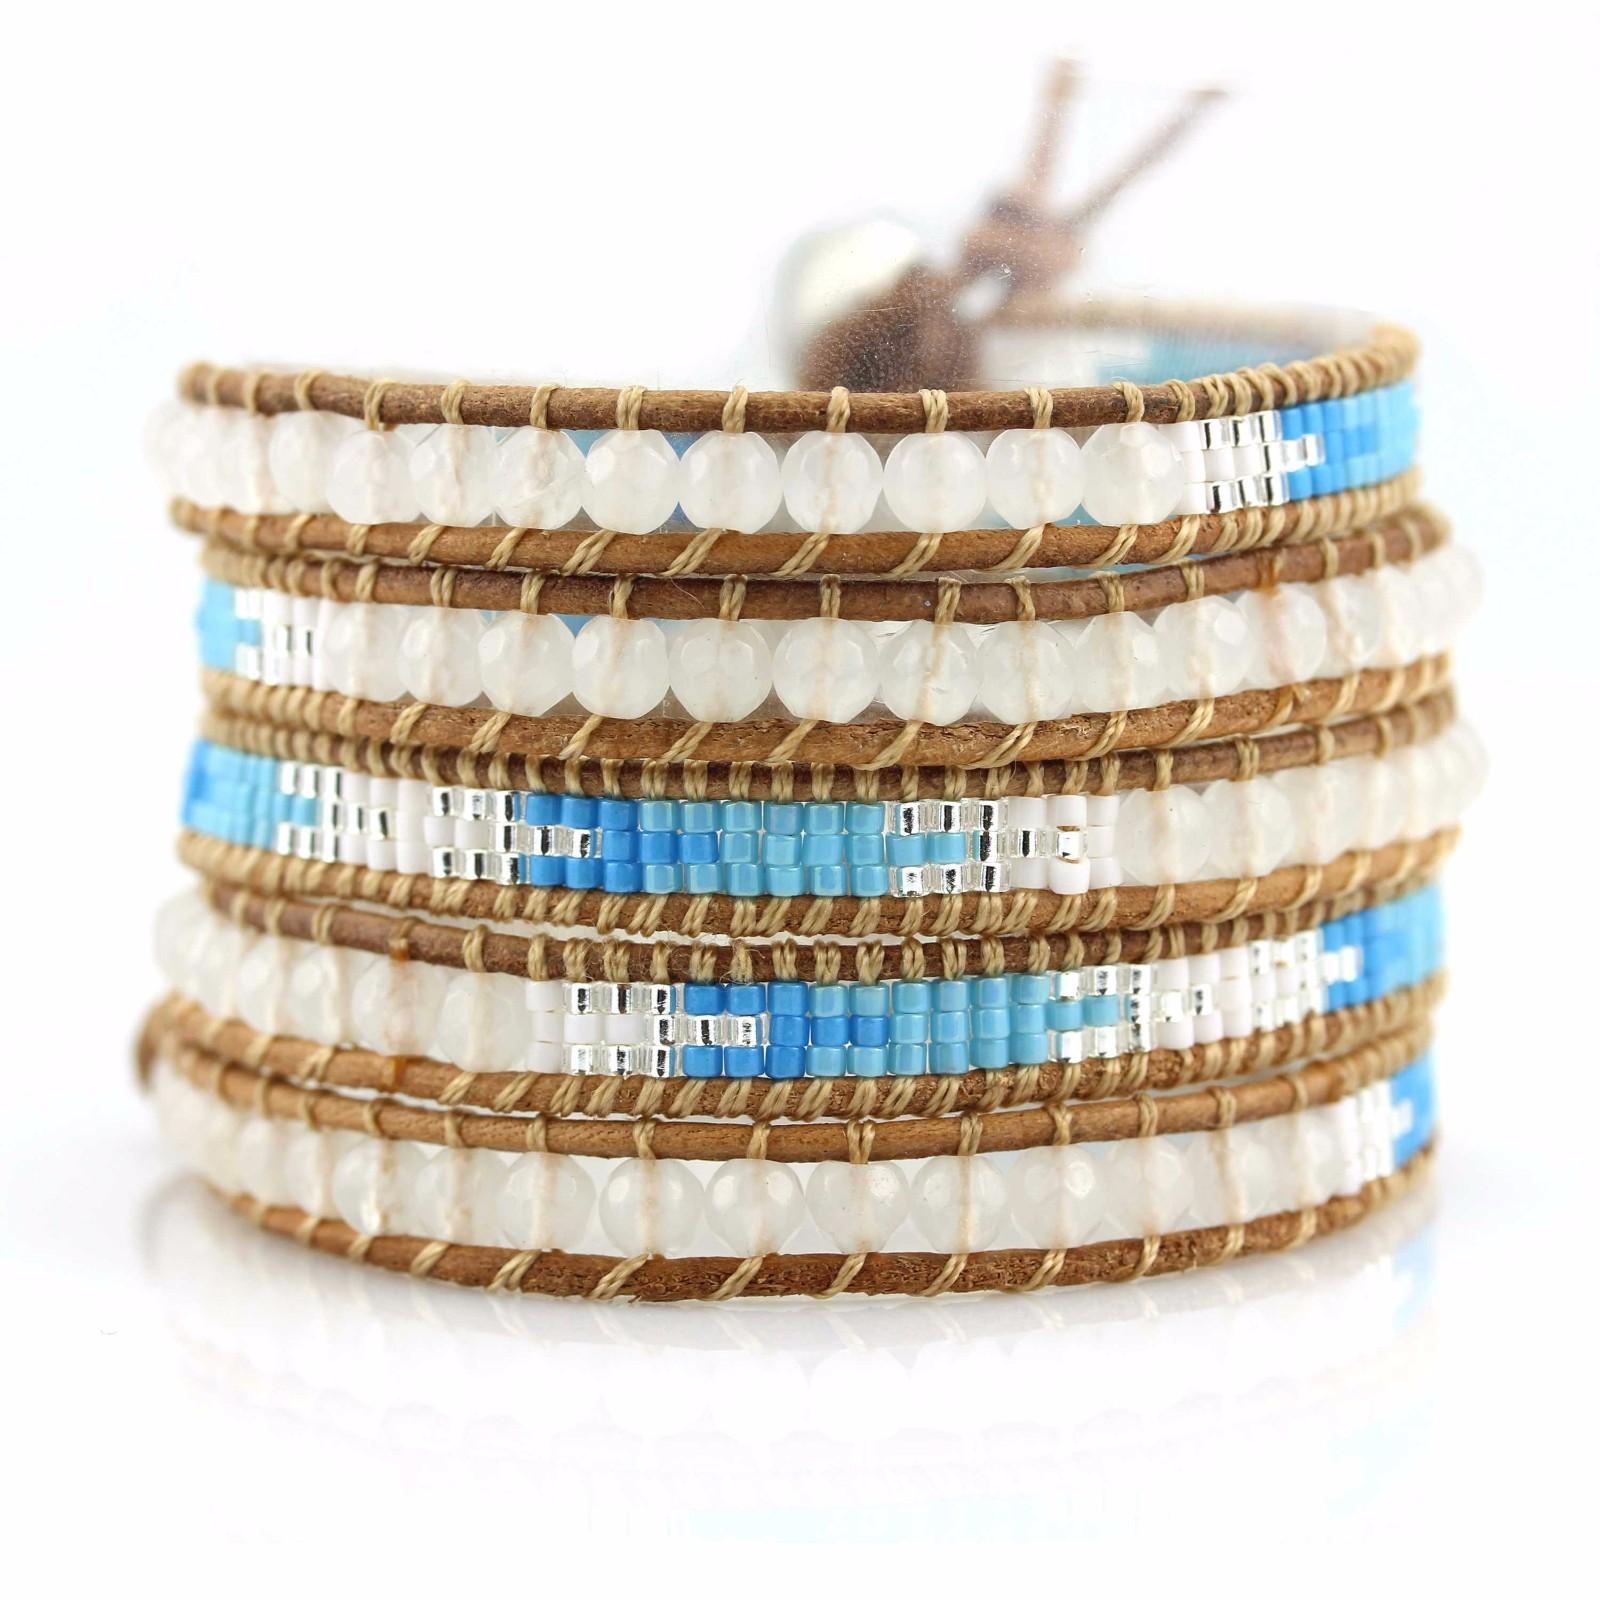 TTT Jewelry Brand seed natural genuine boho wrap bracelet bracelet